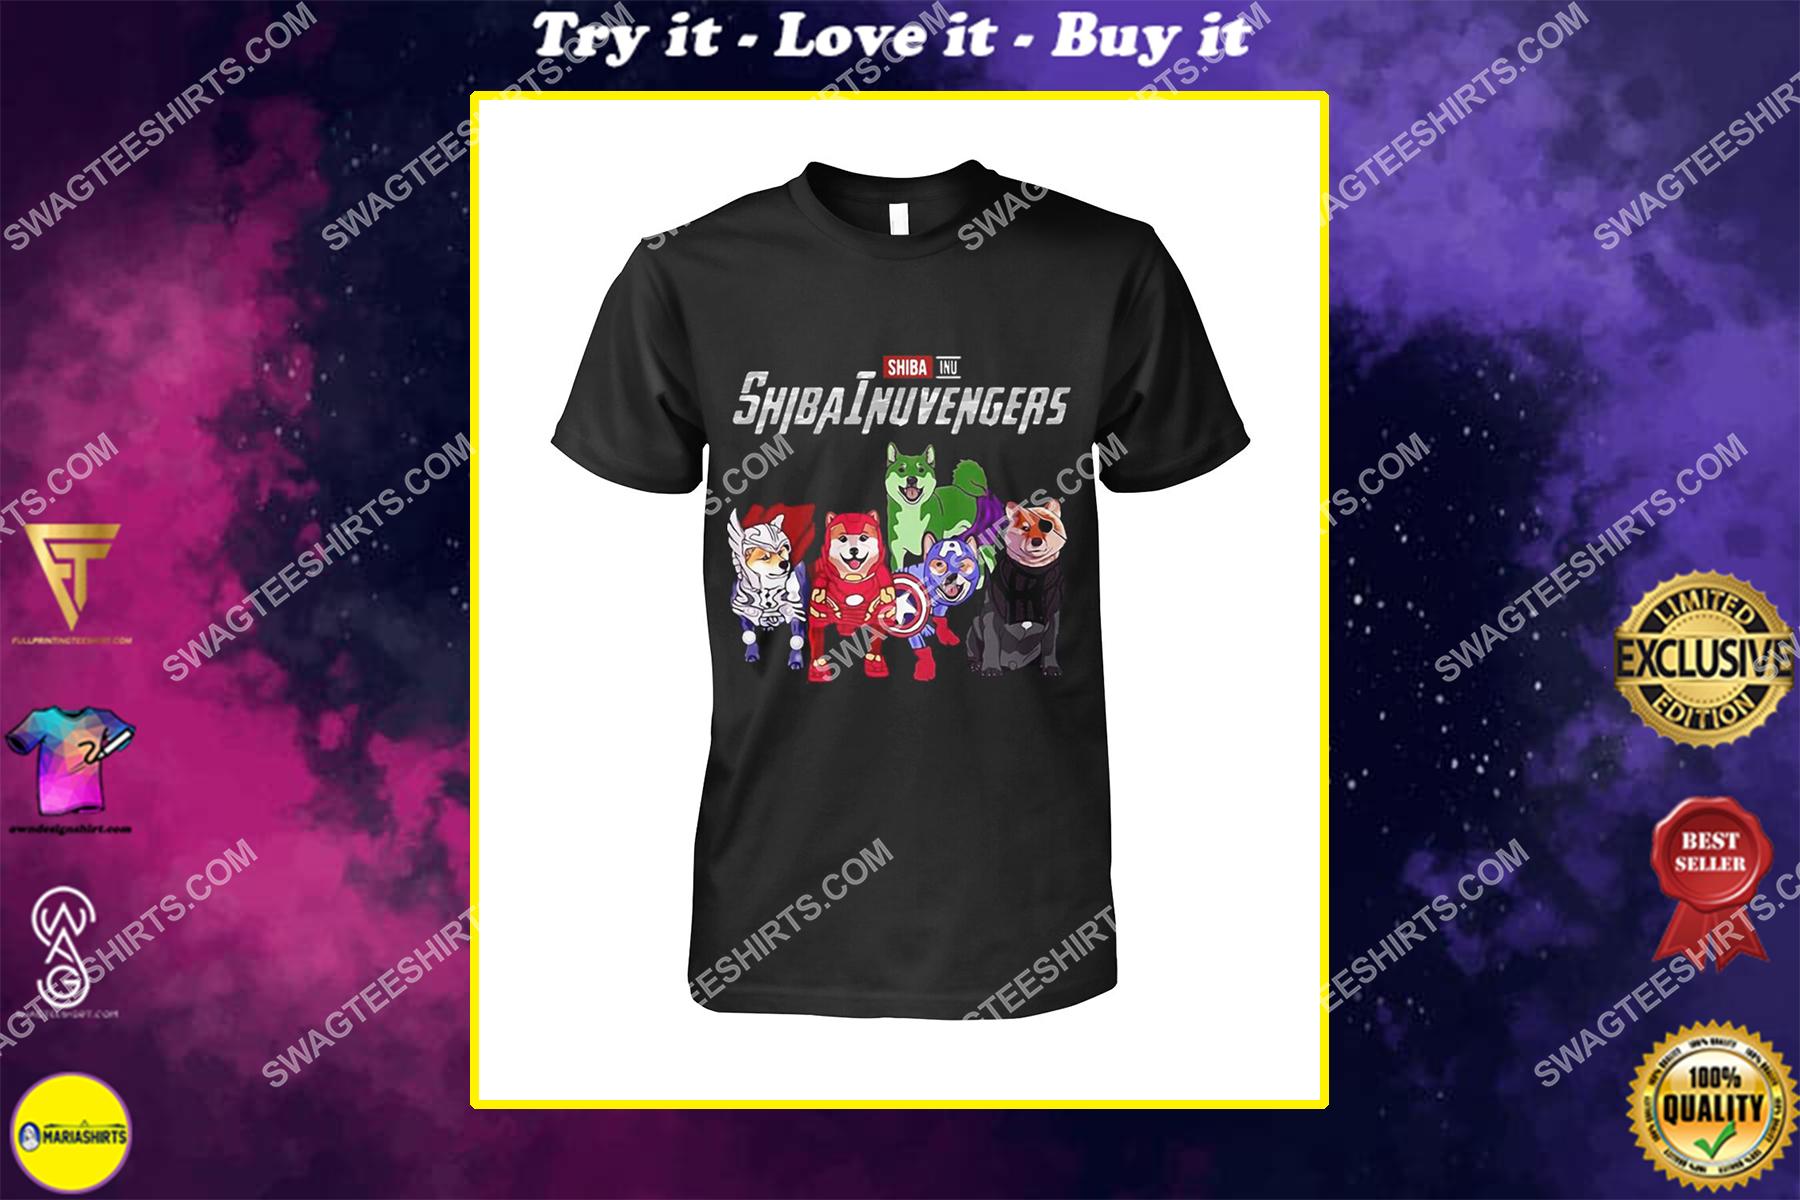 shiba inu shibainuvengers marvel avengers dogs lover shirt